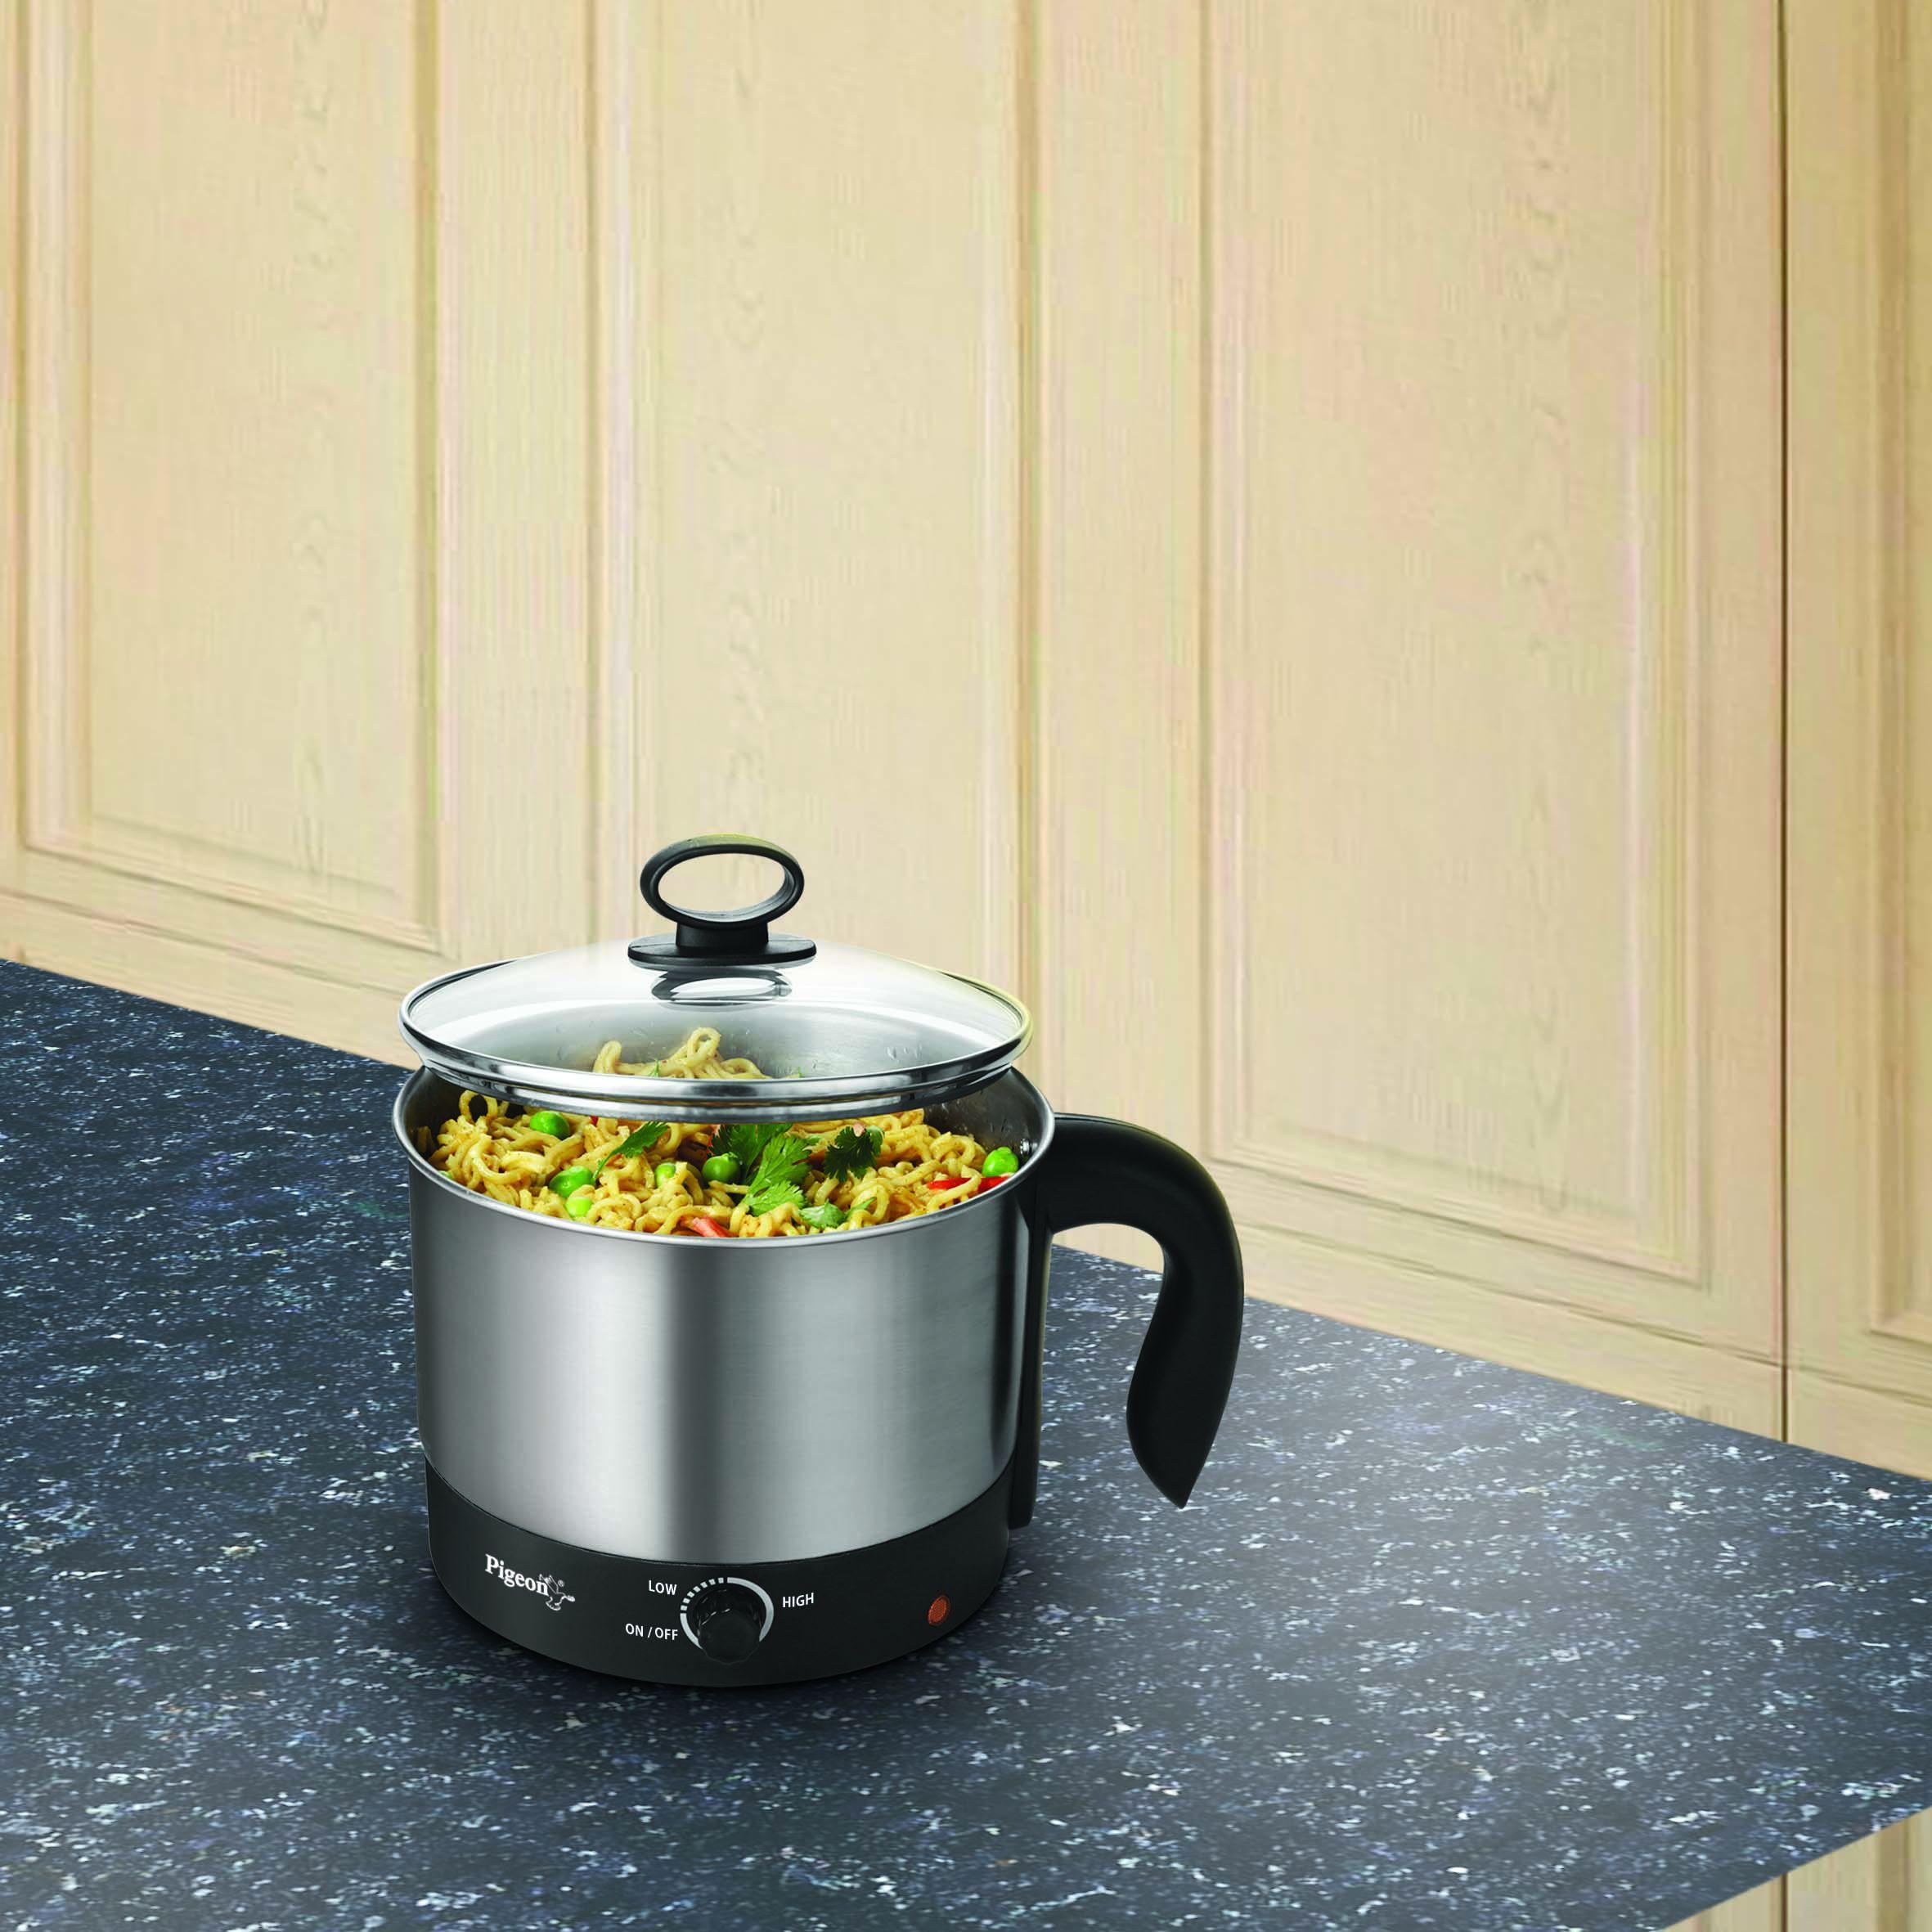 pigeon kessel 1 2 600 stainless steel electric kettle